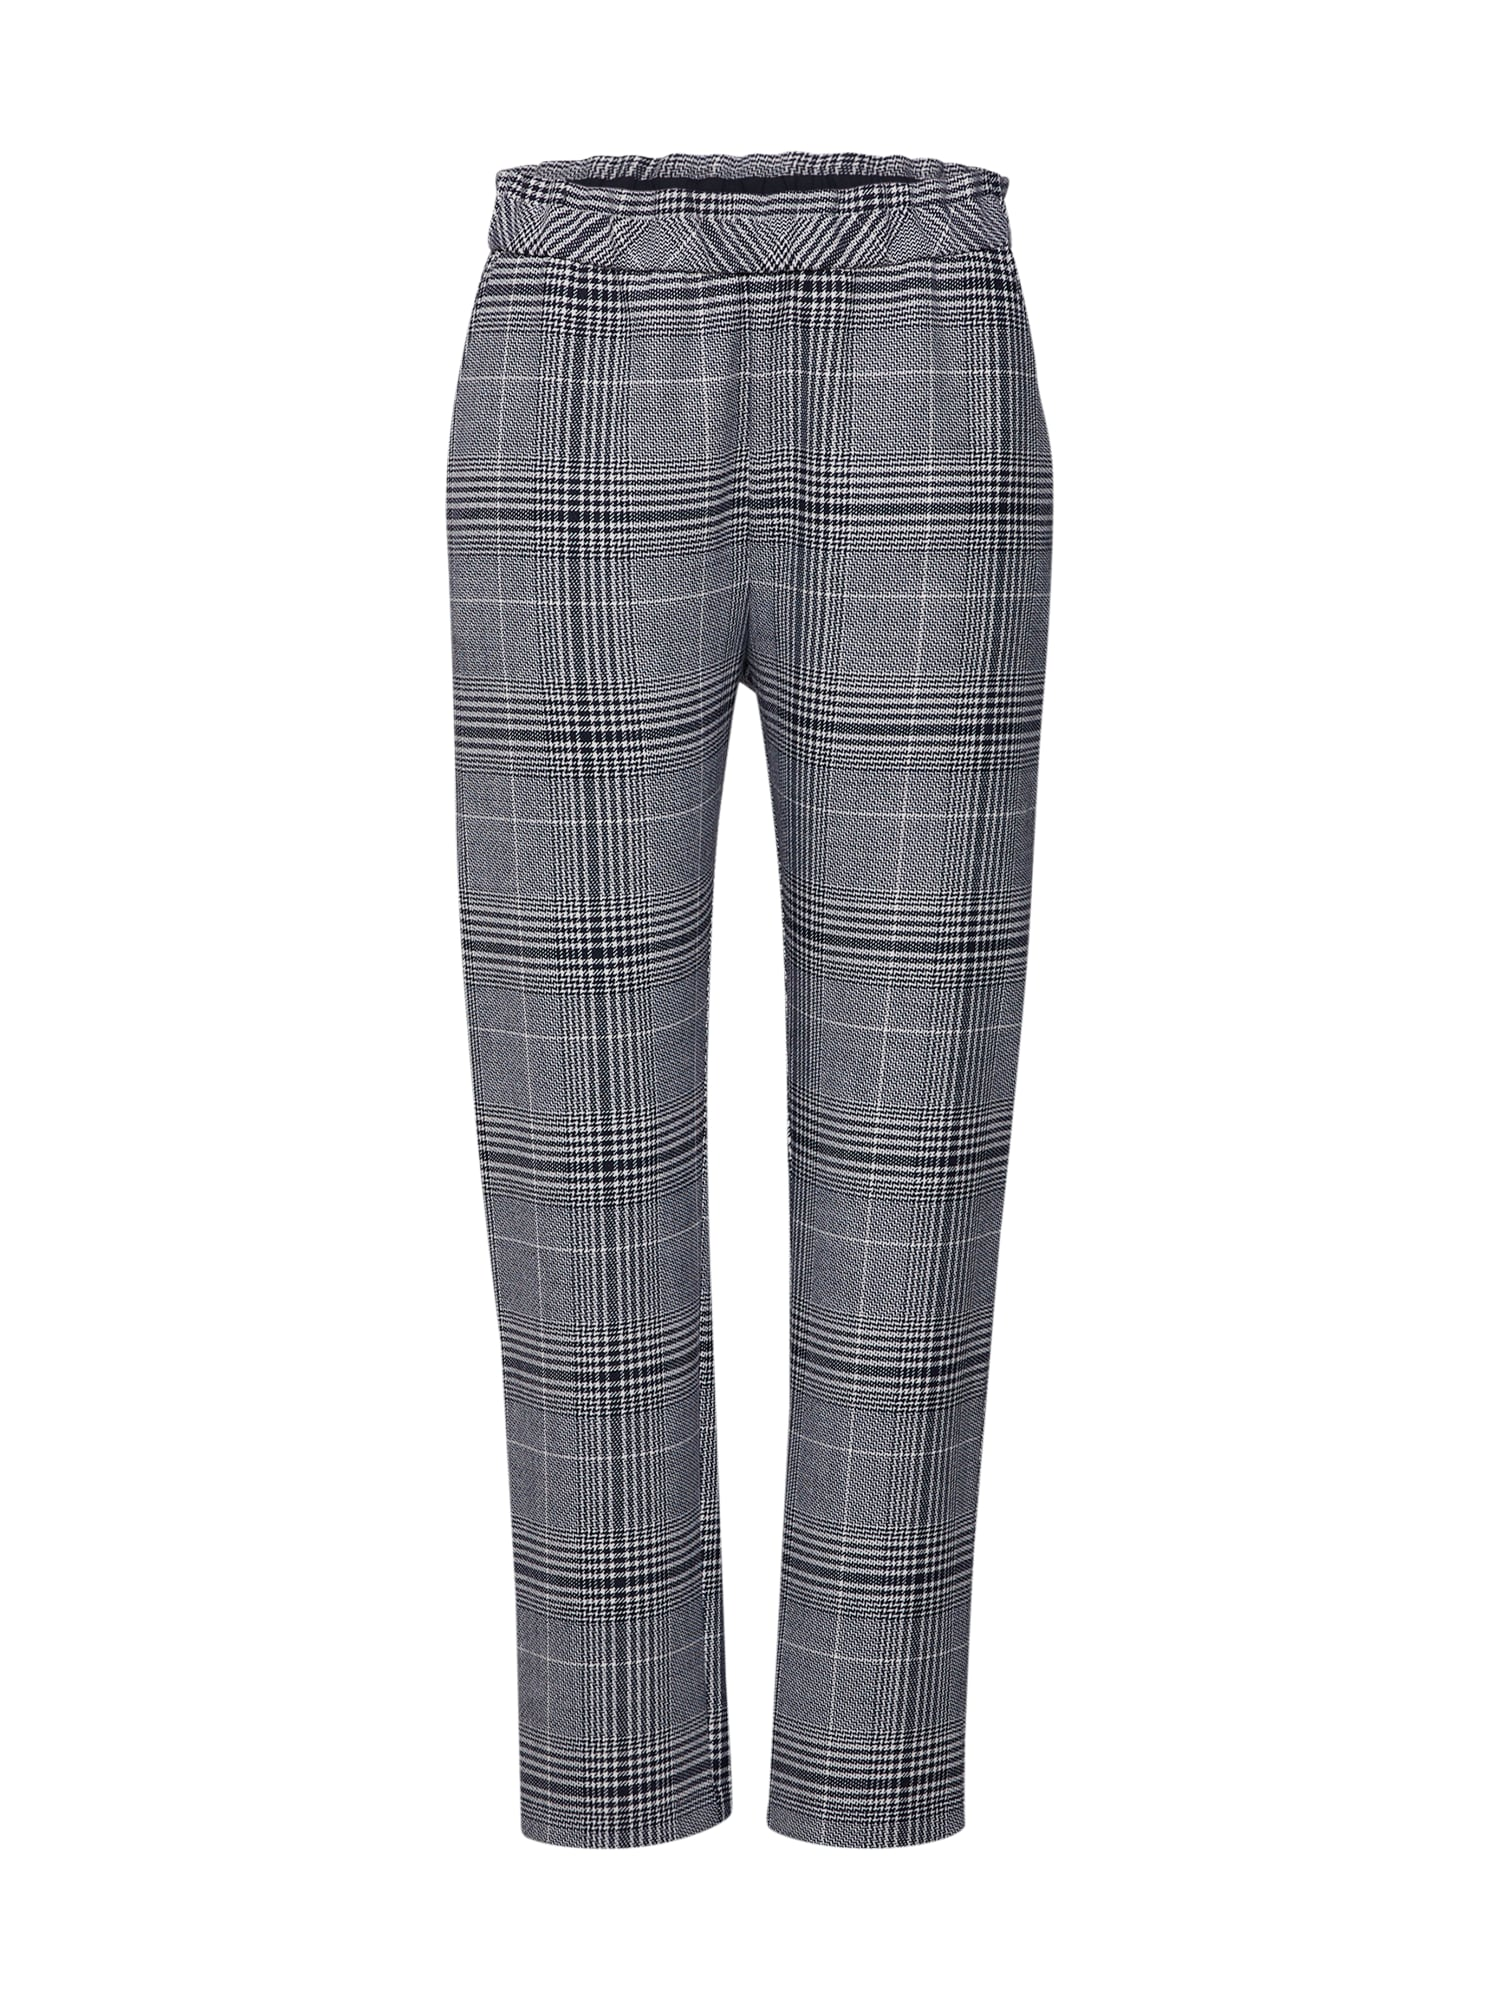 Kalhoty Saluido3 šedá BOSS